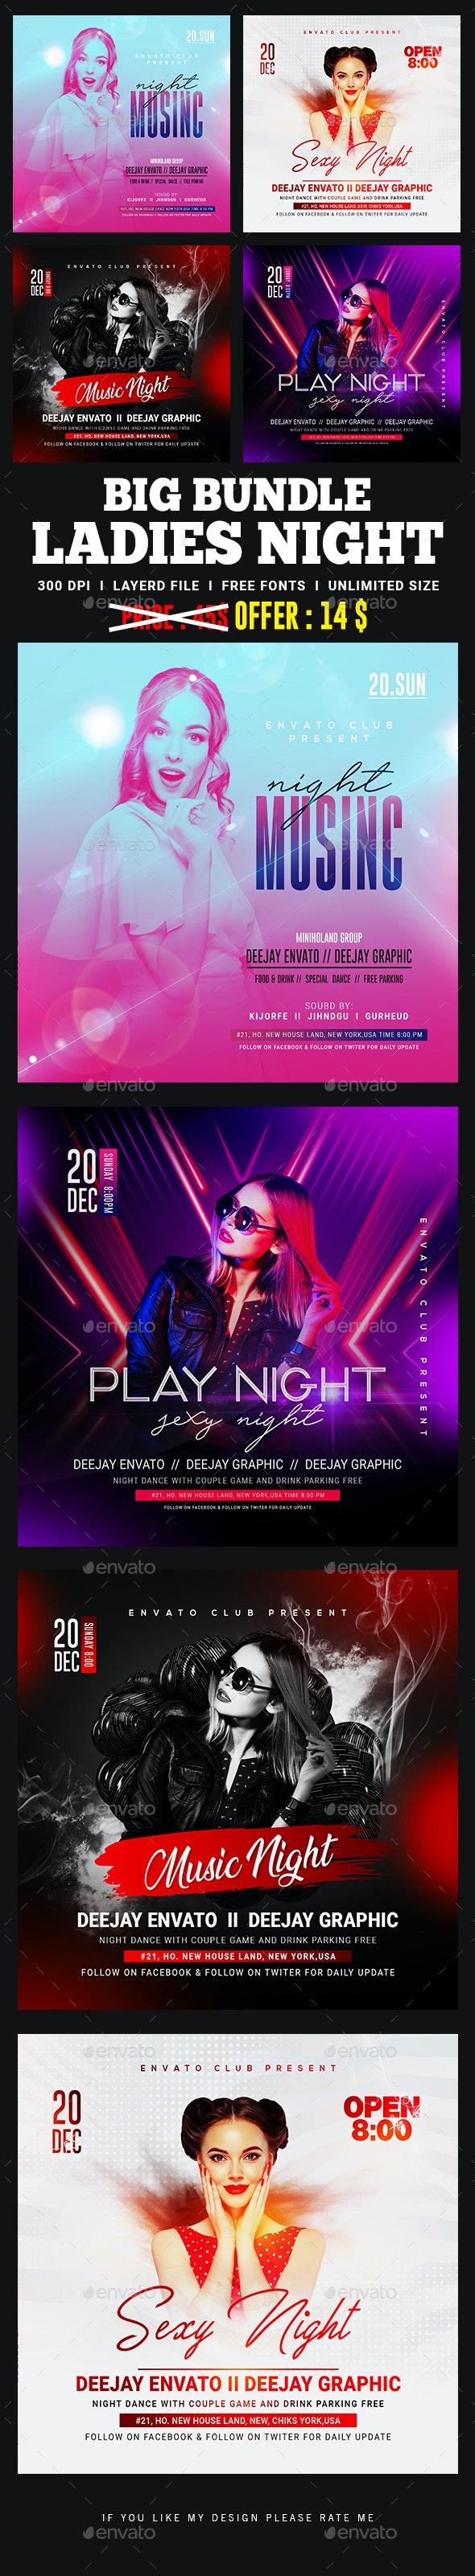 Ladies Night Club Flyer Bundle - Clubs & Parties Events